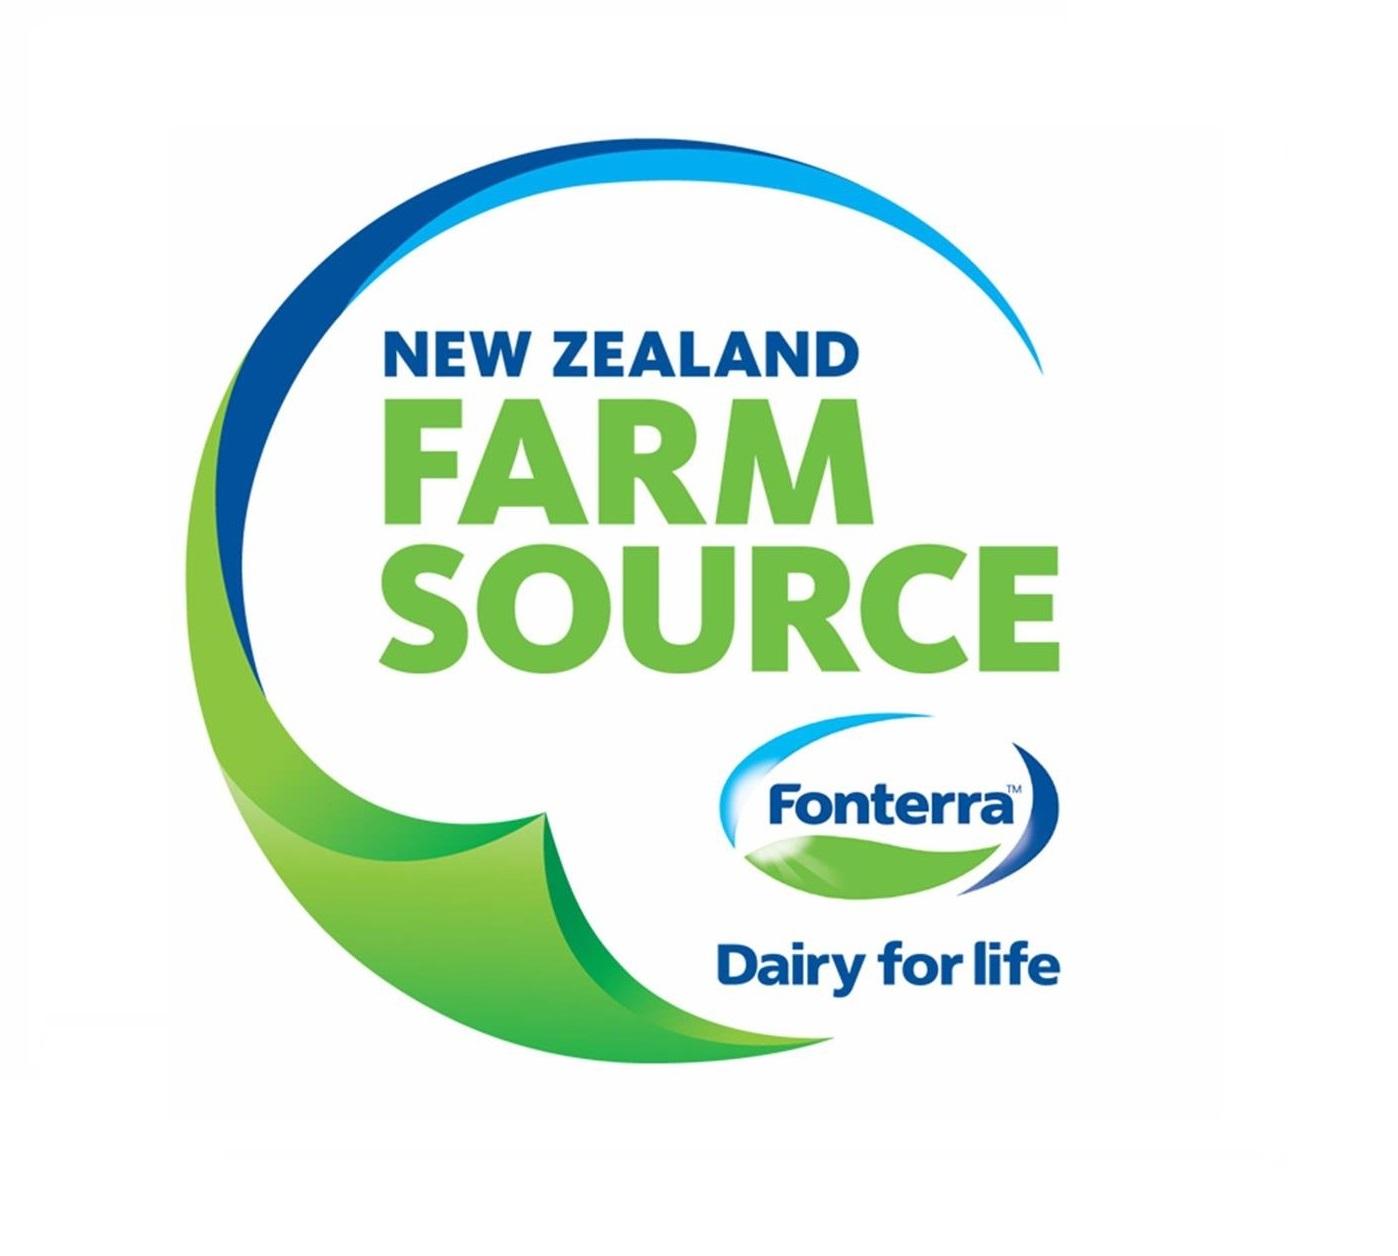 NEW ZEALAND FARM SOURCE